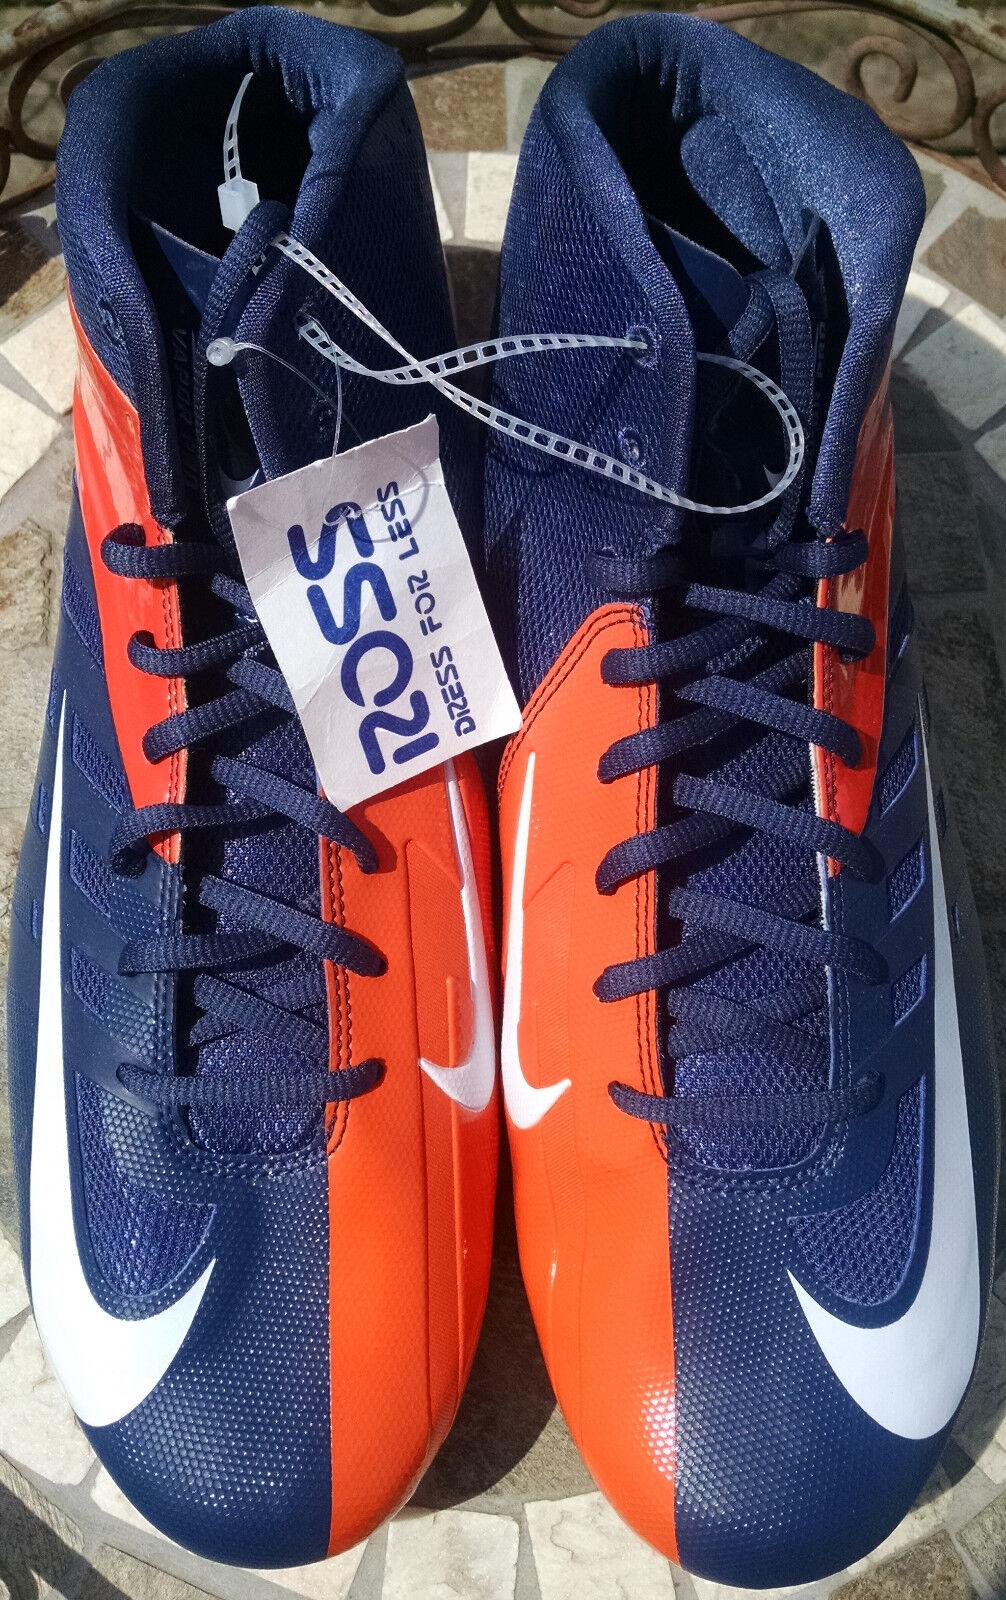 Nike Vapor Pro Mid bluee orange & bluee White Men's Football Cleats size 14.5 US